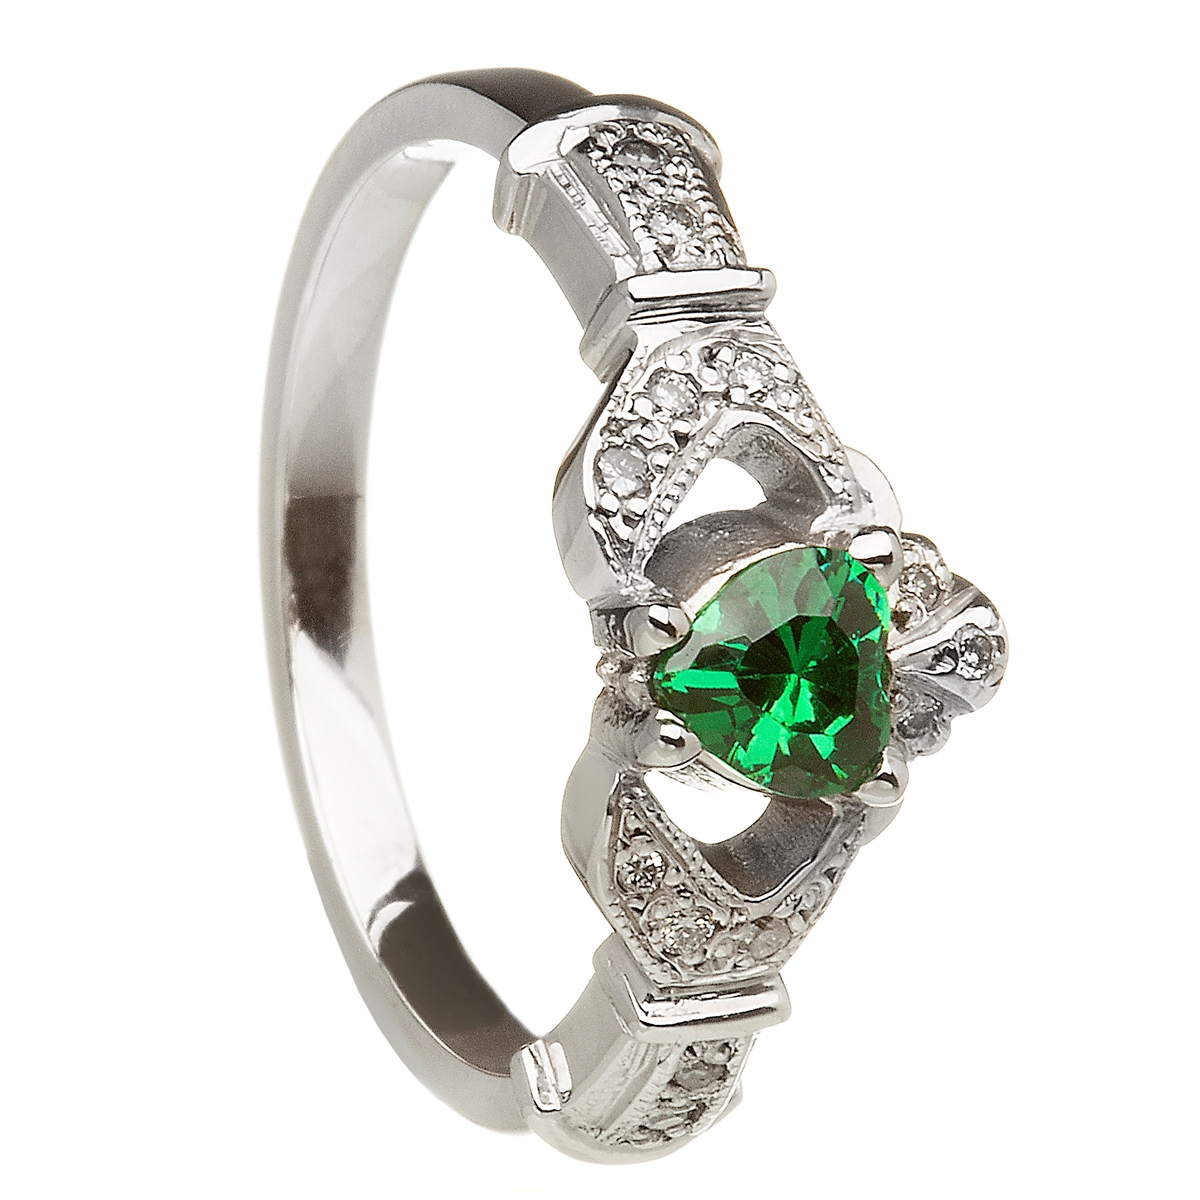 14k white gold emerald set heart claddagh ring wedding ring set